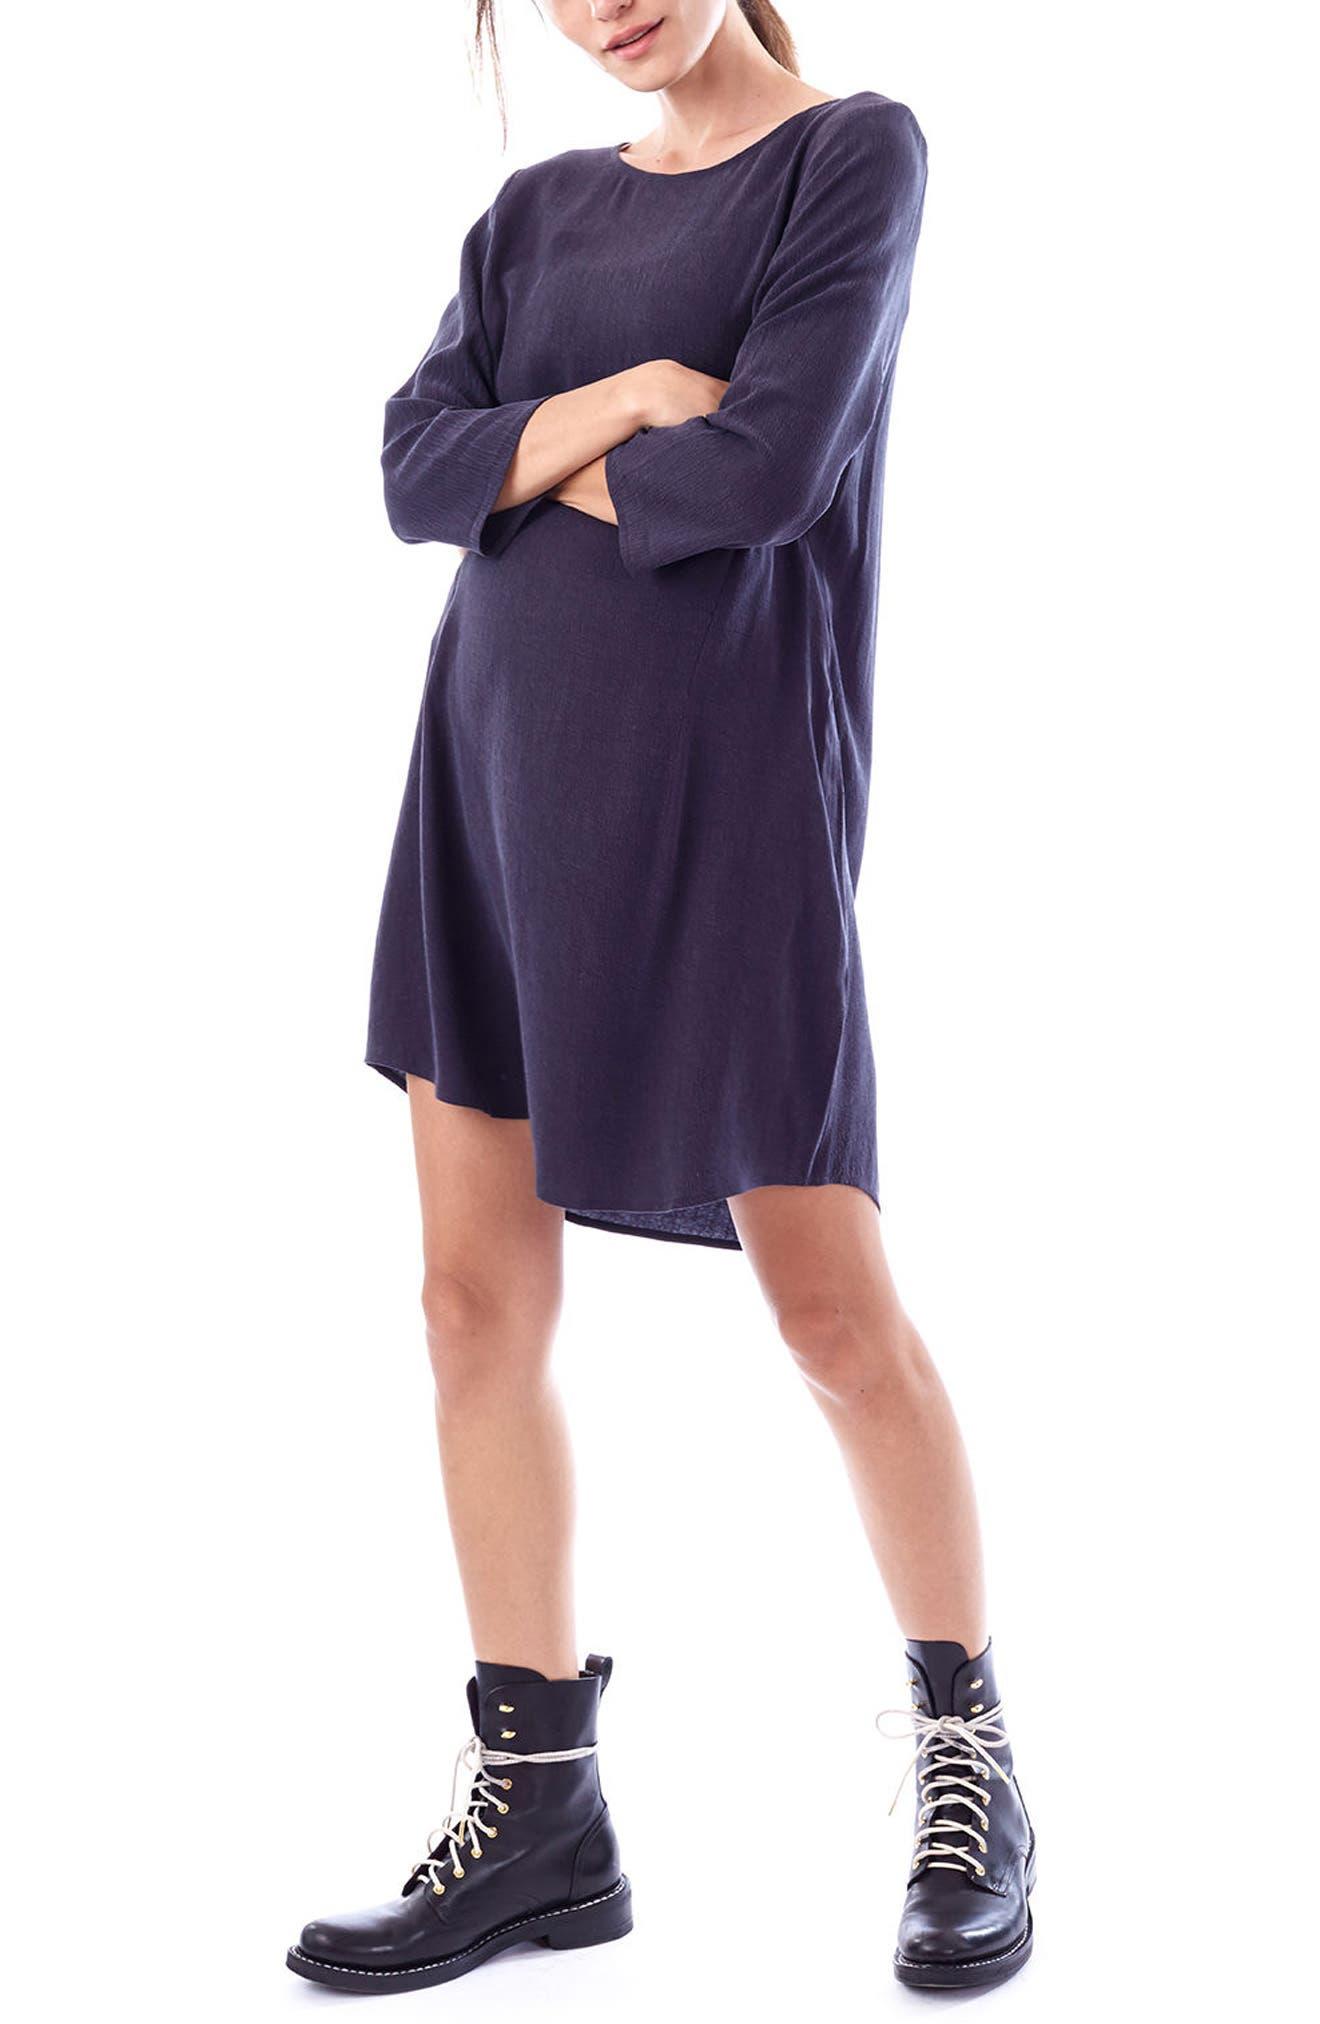 Layla Maternity/Nursing Dress,                             Main thumbnail 1, color,                             CHARCOAL